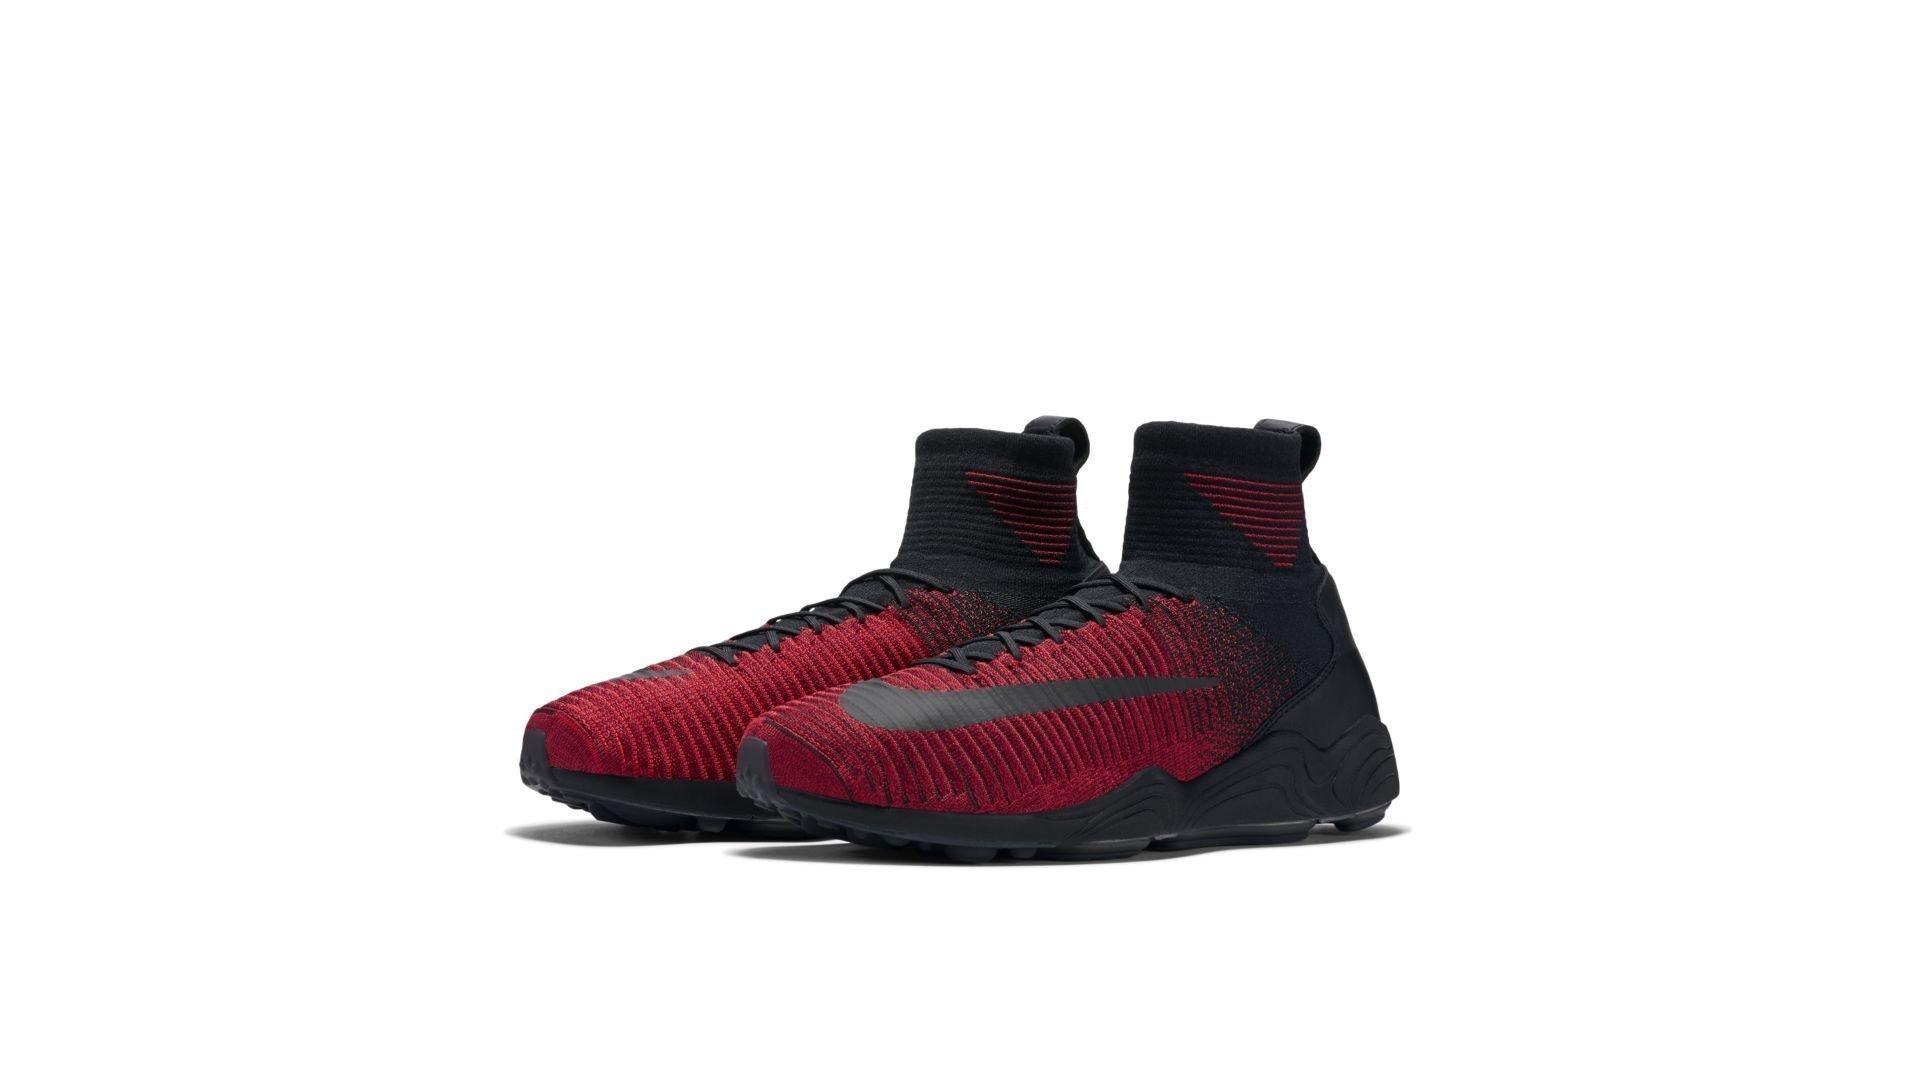 Nike Mercurial XI Flyknit University Red Black (852616-600)